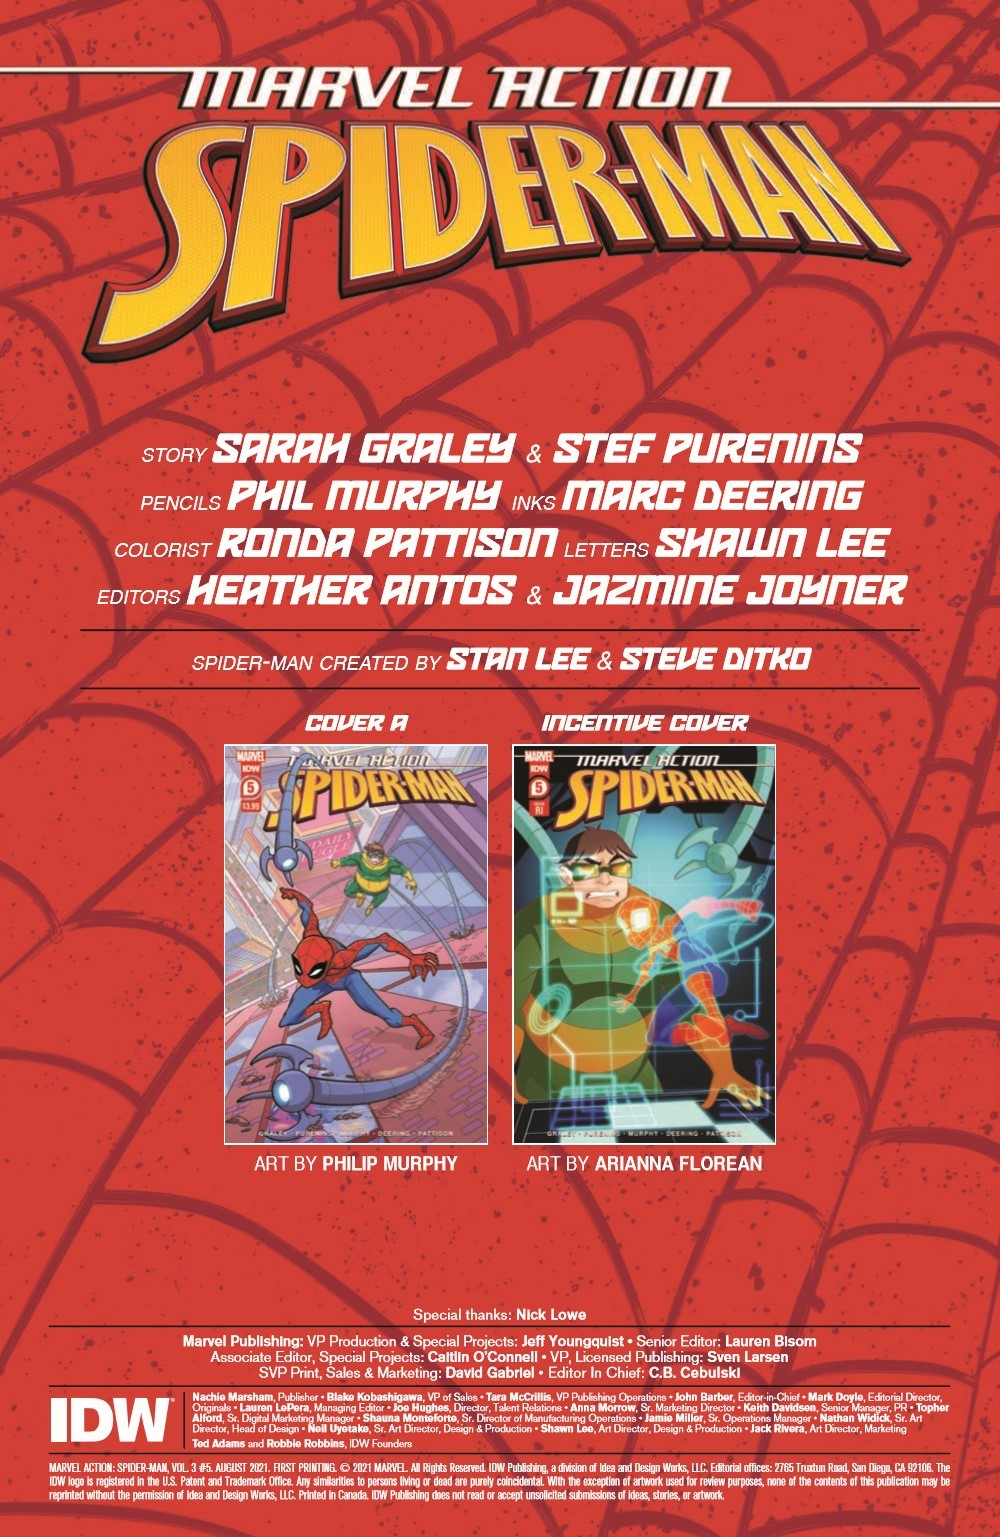 SpidermanV3-05_pr-2 ComicList Previews: MARVEL ACTION SPIDER-MAN VOLUME 3 #5